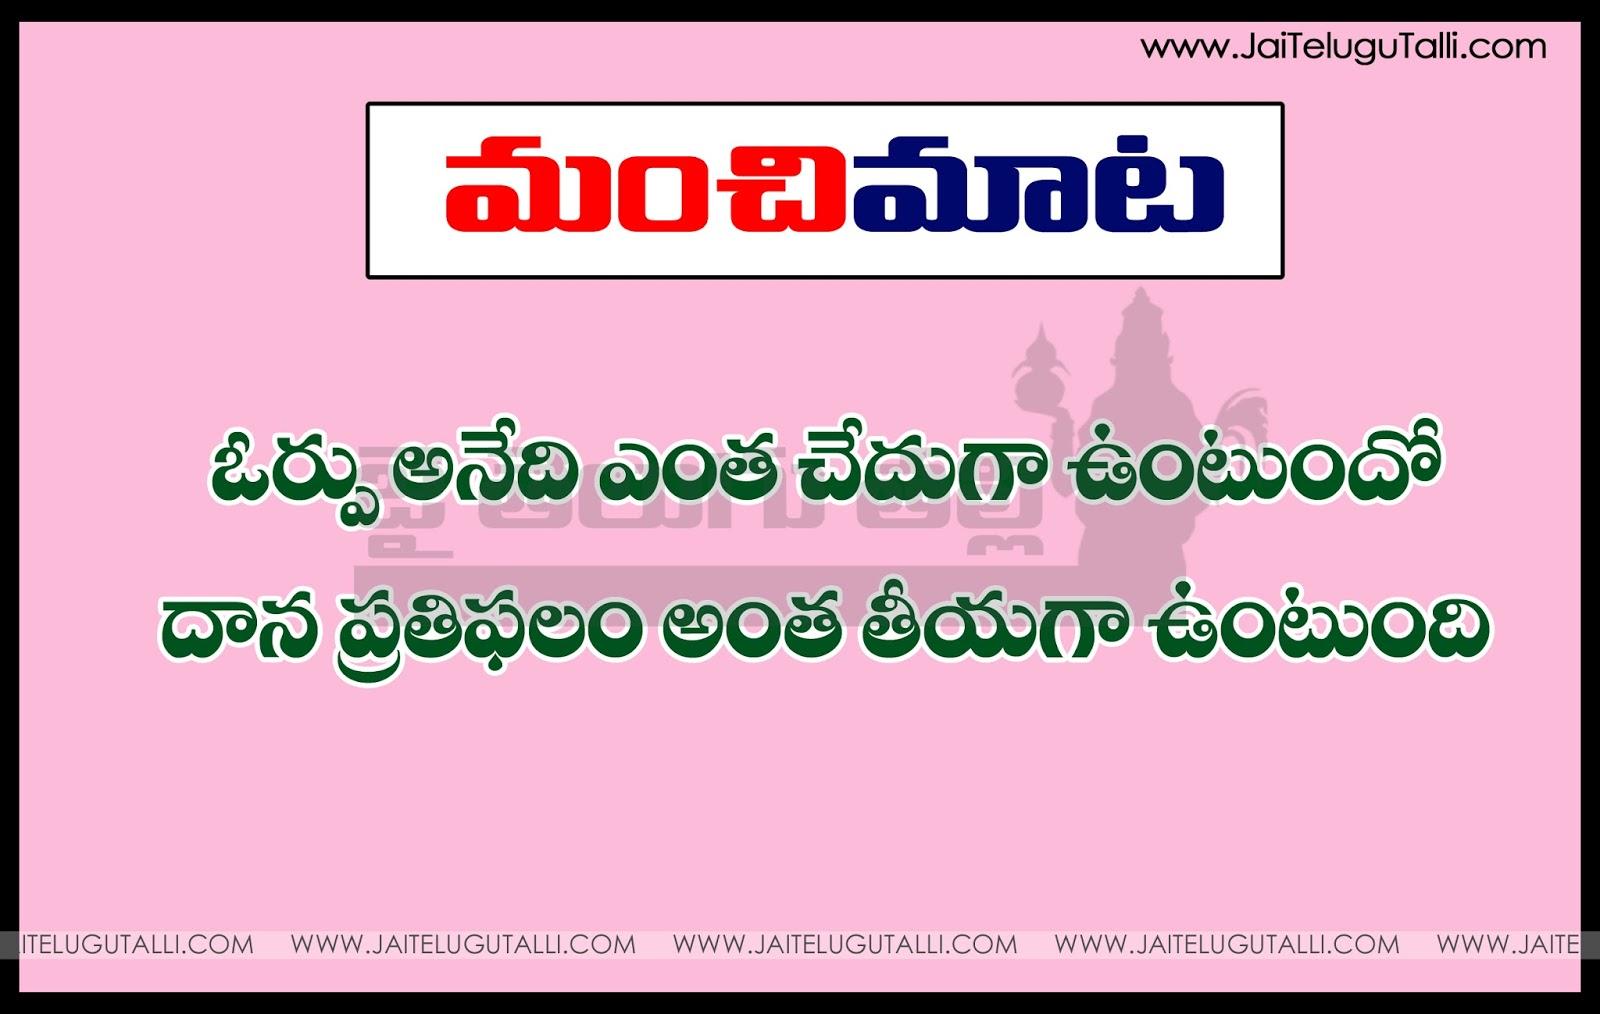 Uplifting Quotes For Life Telugu Manchi Matalu Life Inspiration Quotes And Sayings In Telugu